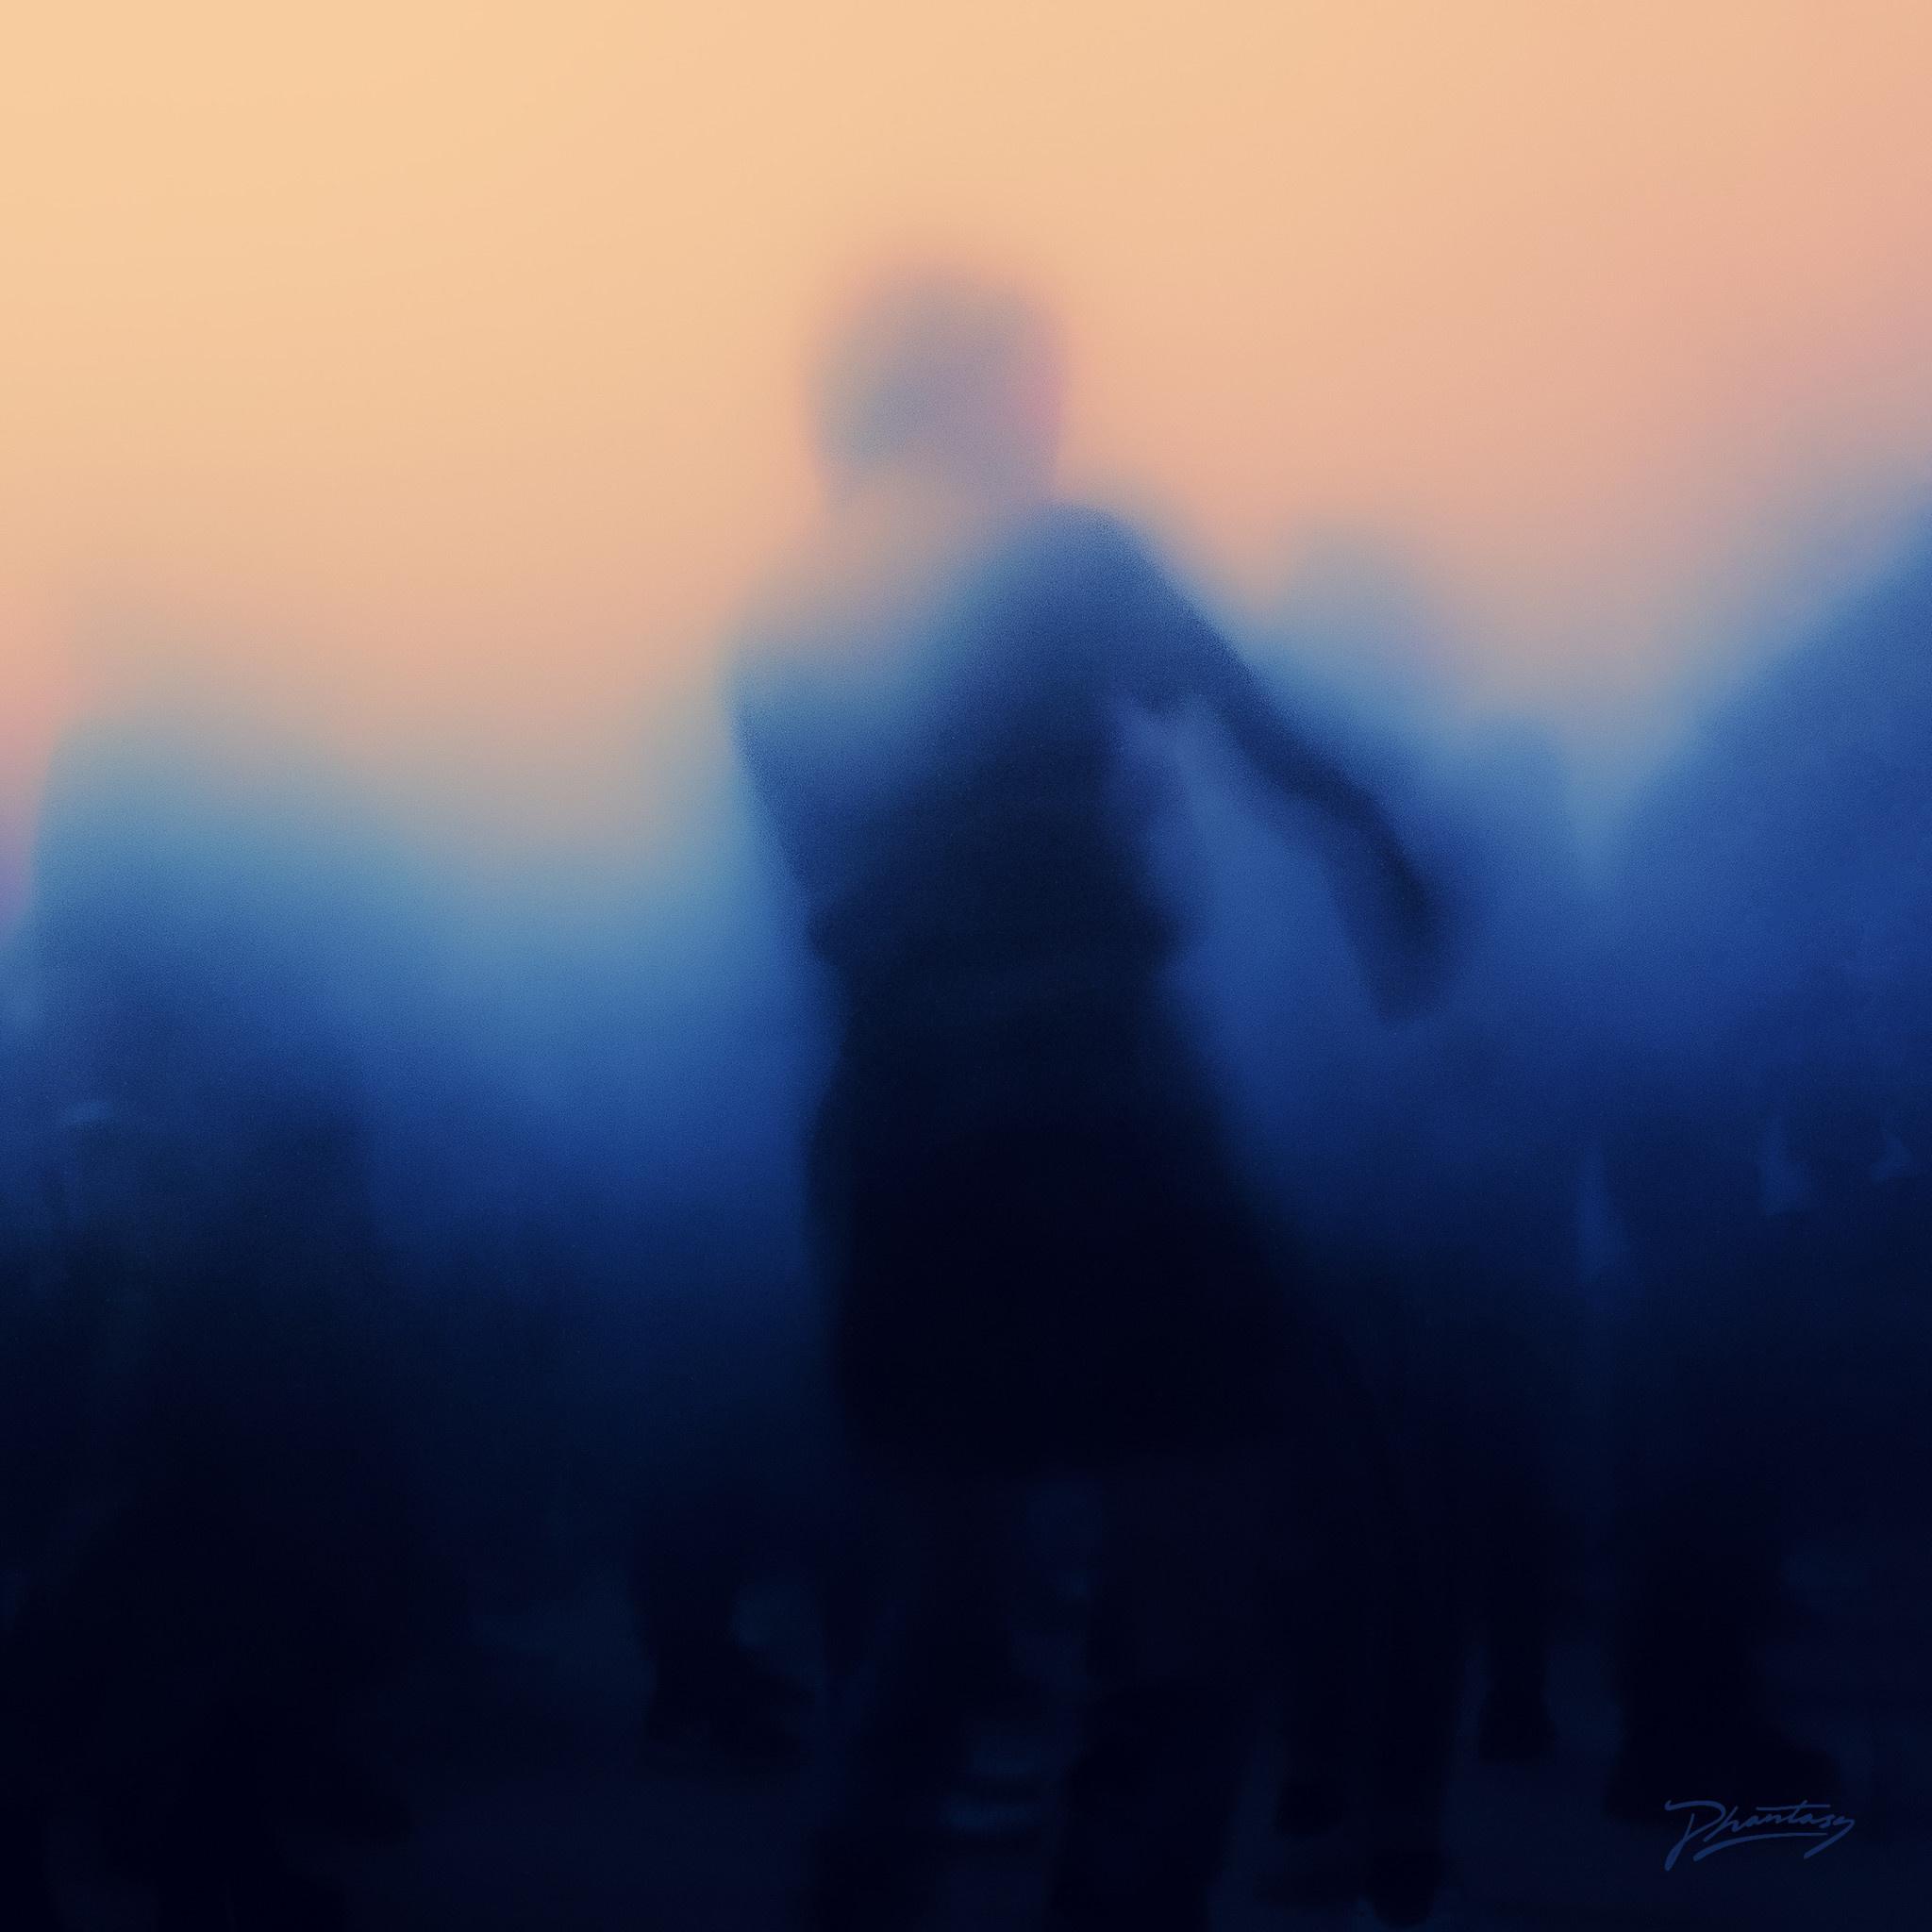 Phantasy Sound Daniel Avery - Love + Light